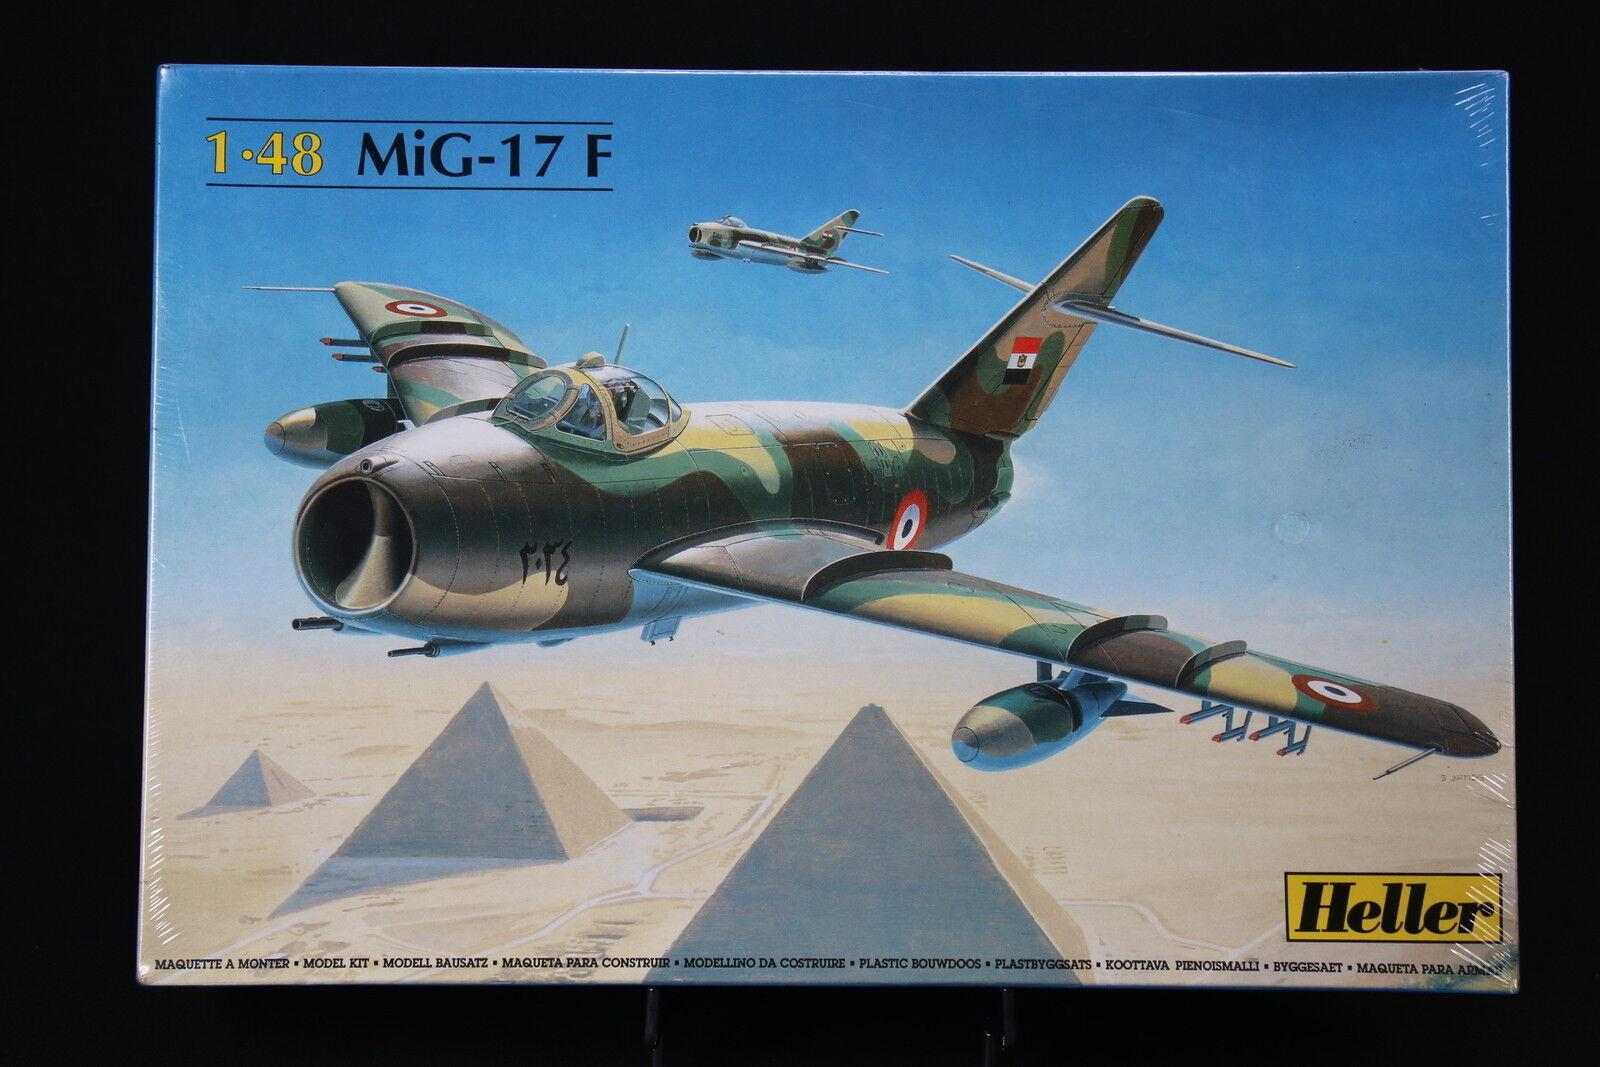 YP010 Heller 1/48 Modellino Aereo 80416 MiG-17 F